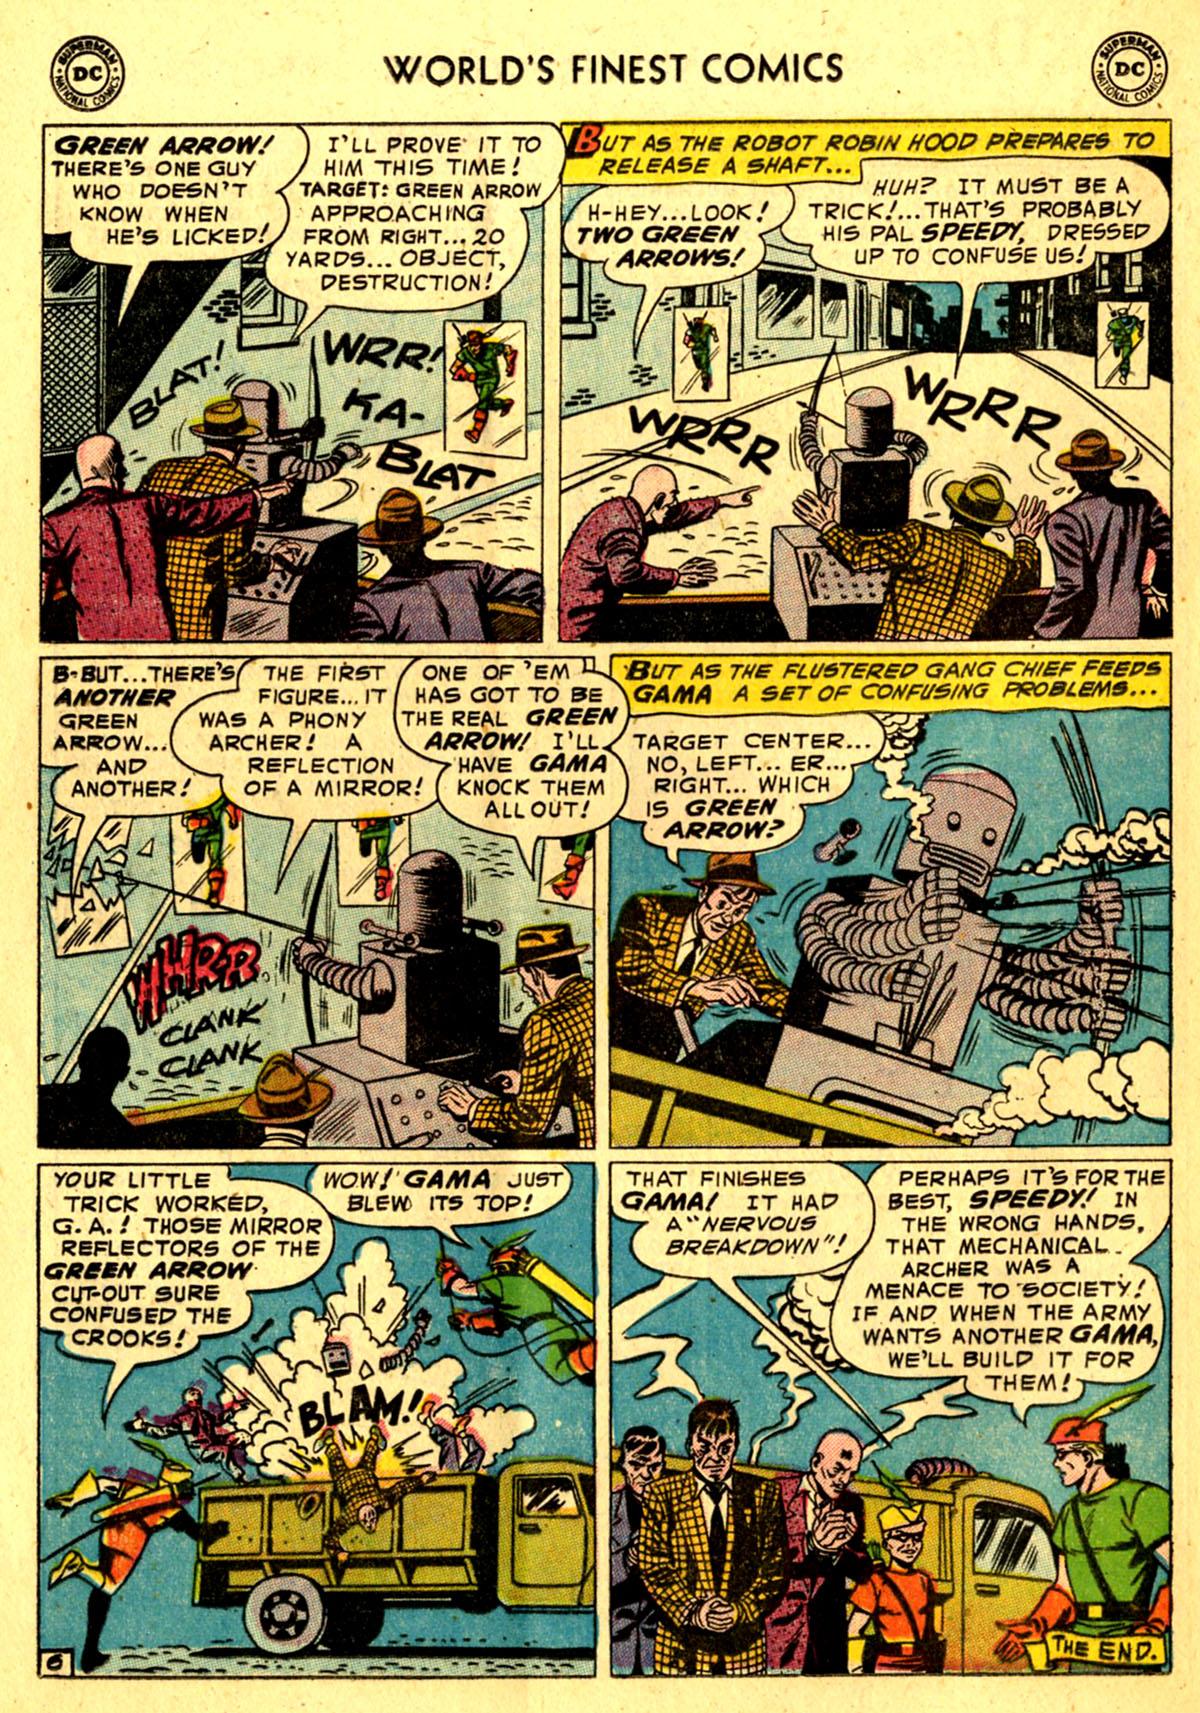 Read online World's Finest Comics comic -  Issue #76 - 24